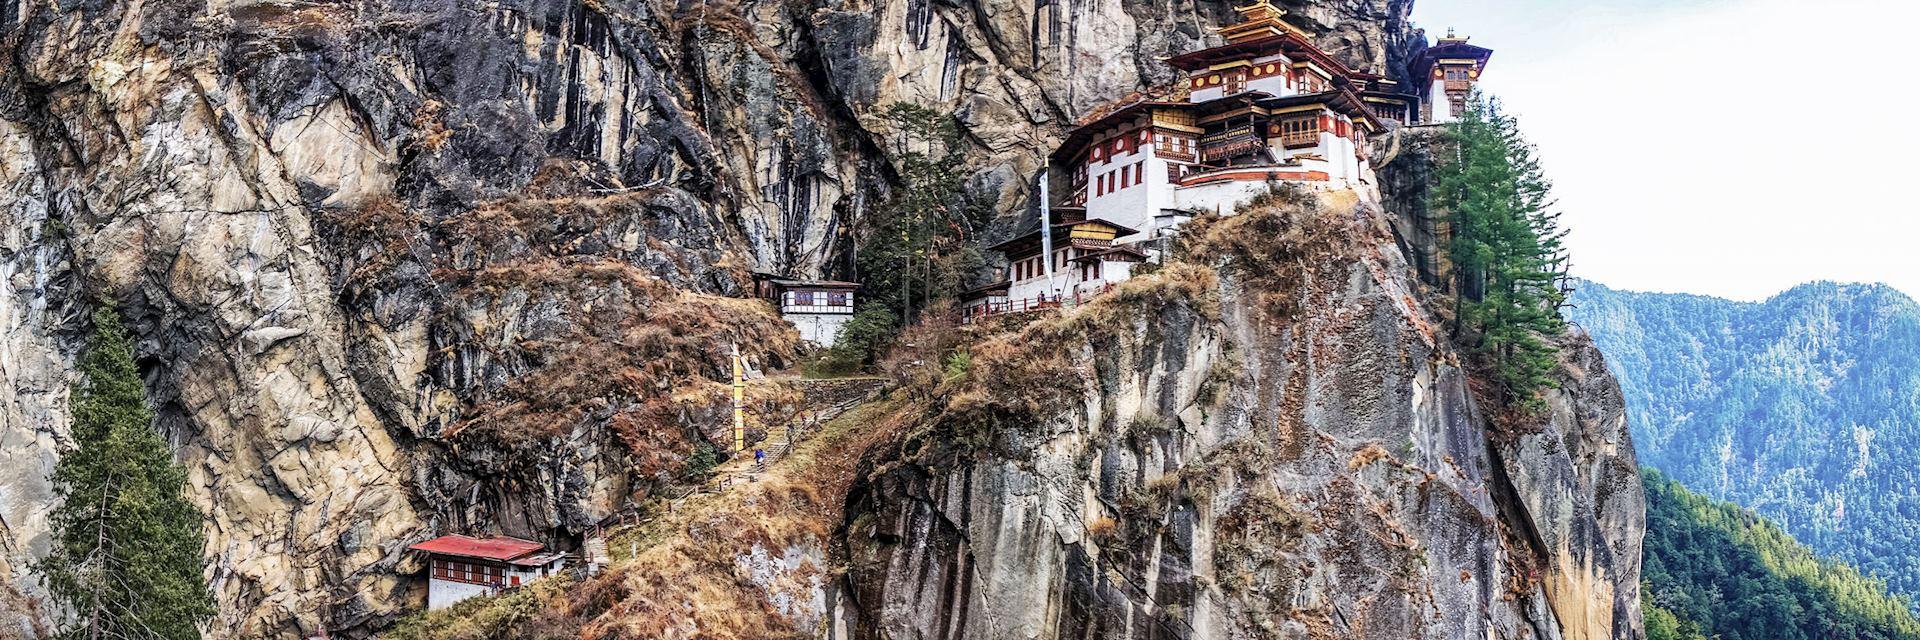 Taktshang, the Tiger's Nest Monastery